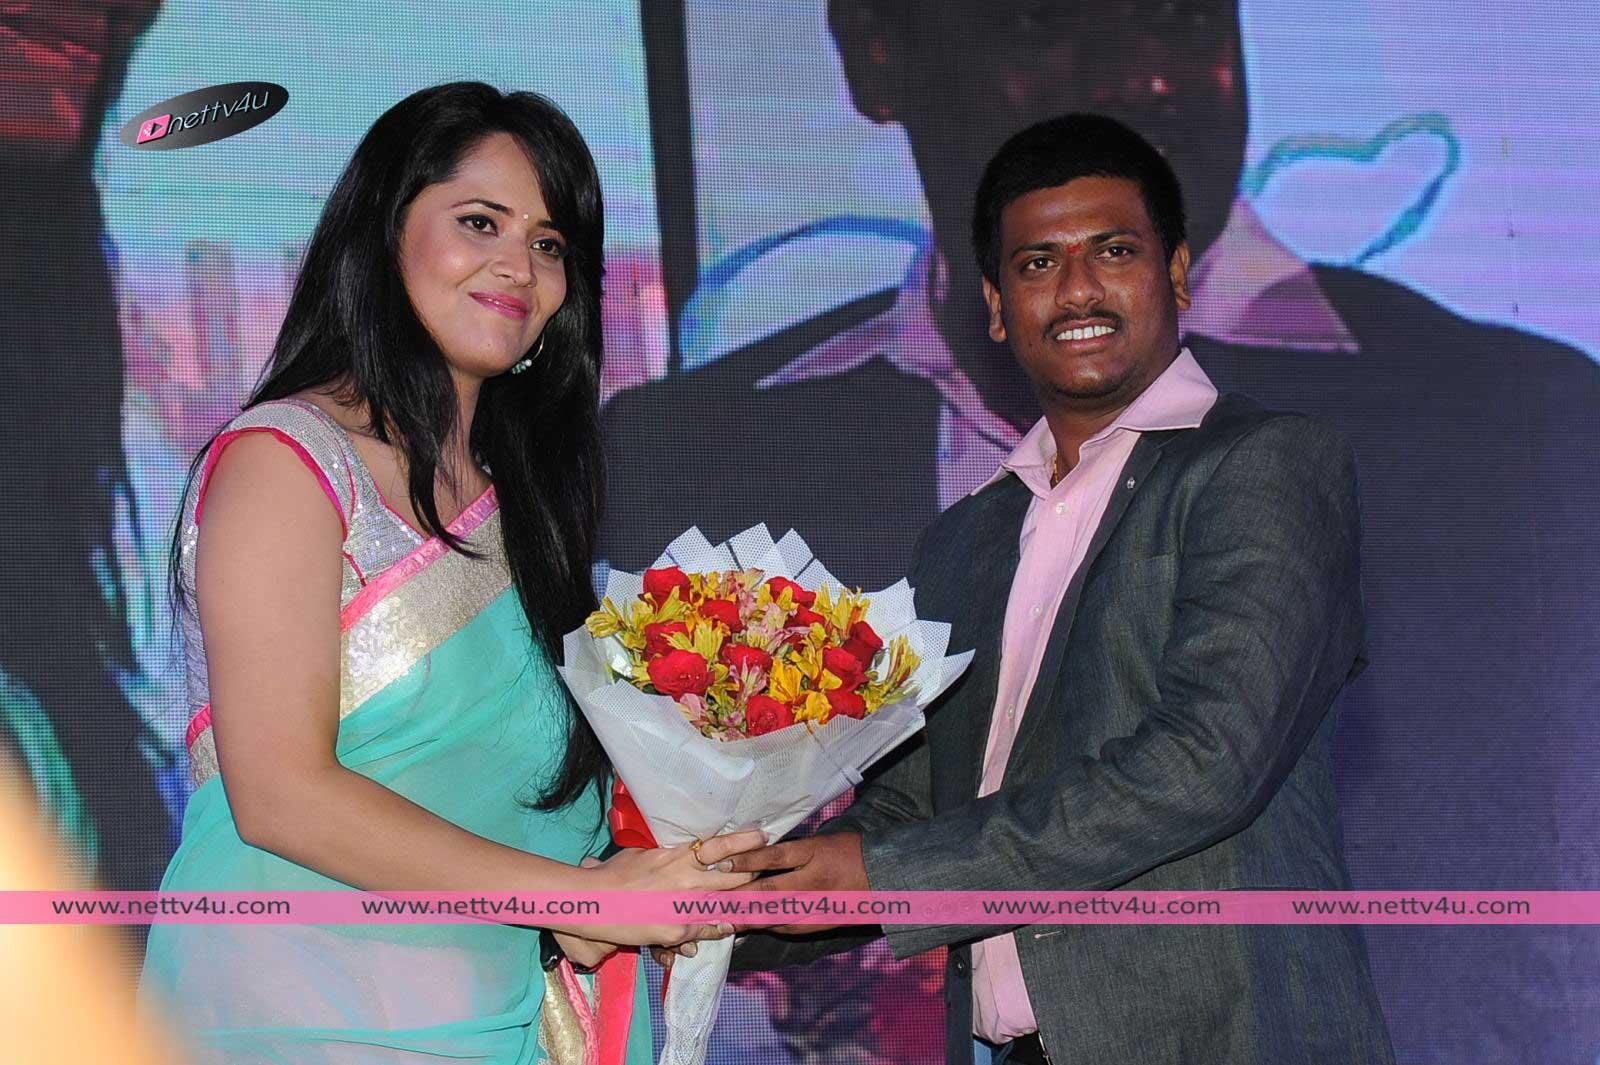 Celebration Pics Of Yuva Media 1st Anniversary